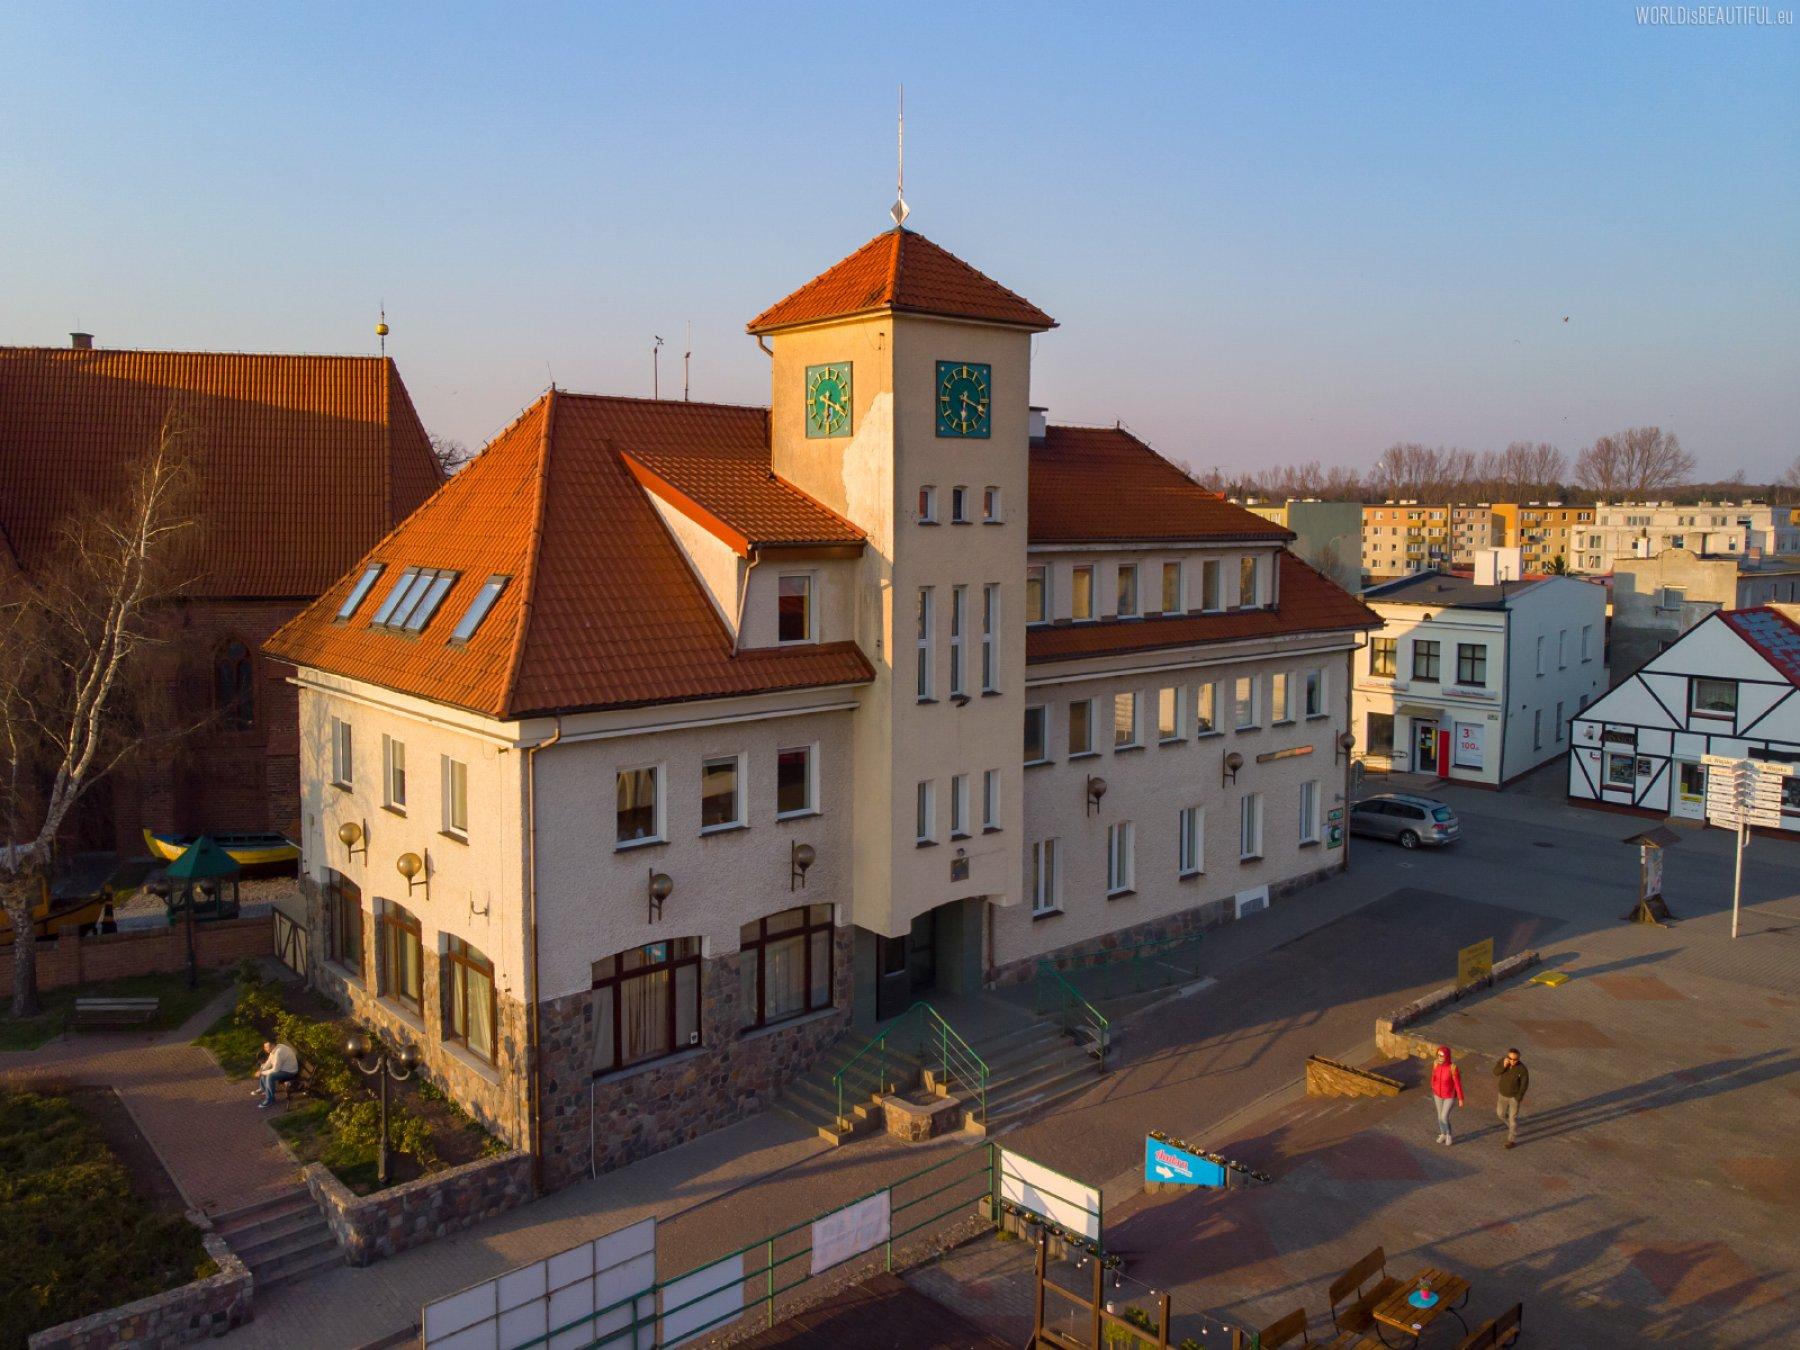 City Hall of Hel